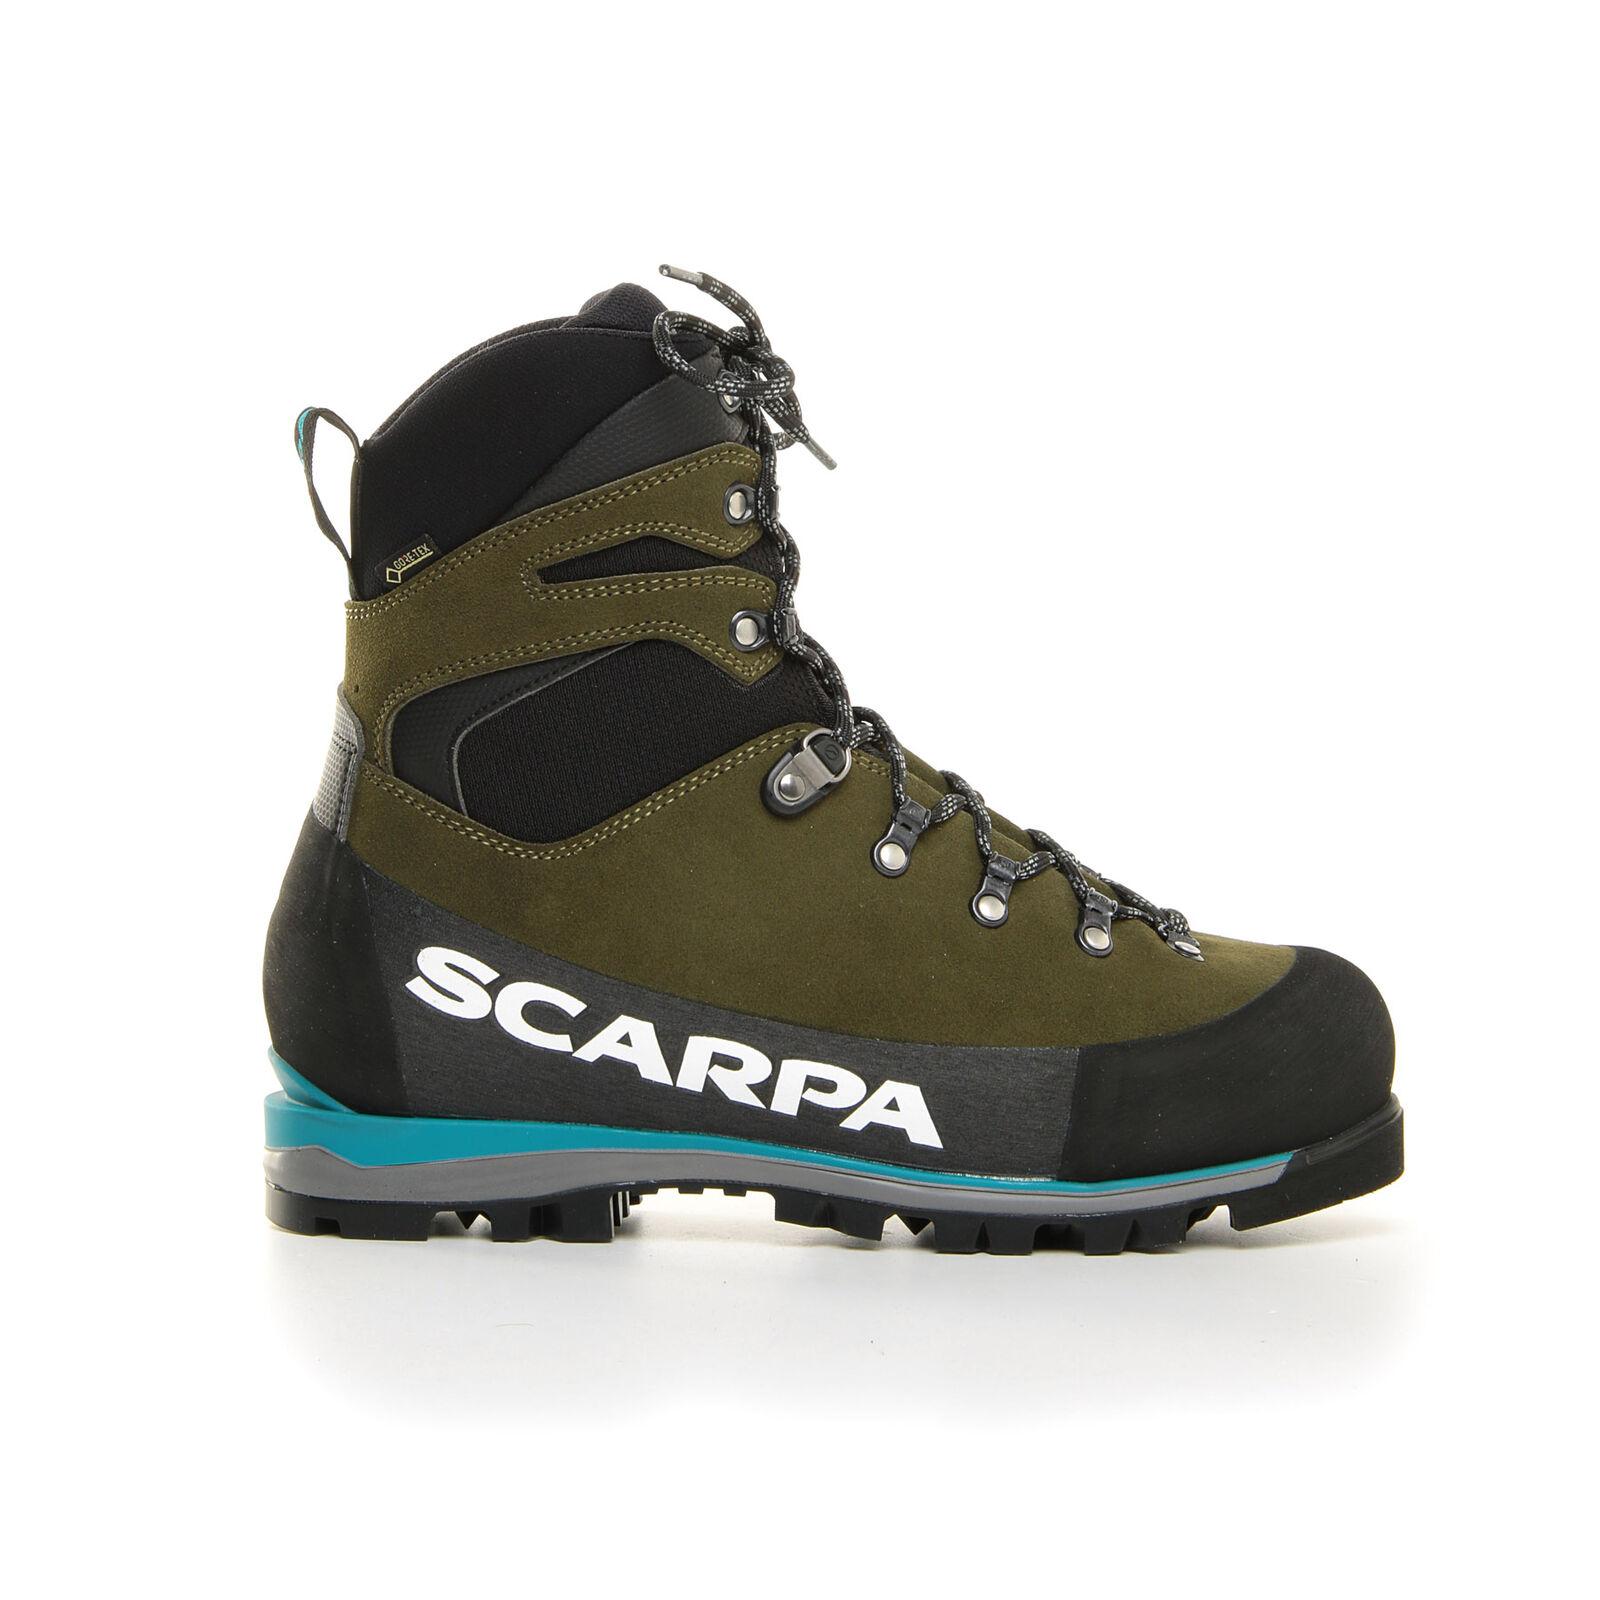 SCARPA GRAND DRU GTX SCARPONI TREKKING UOMO 87504 200